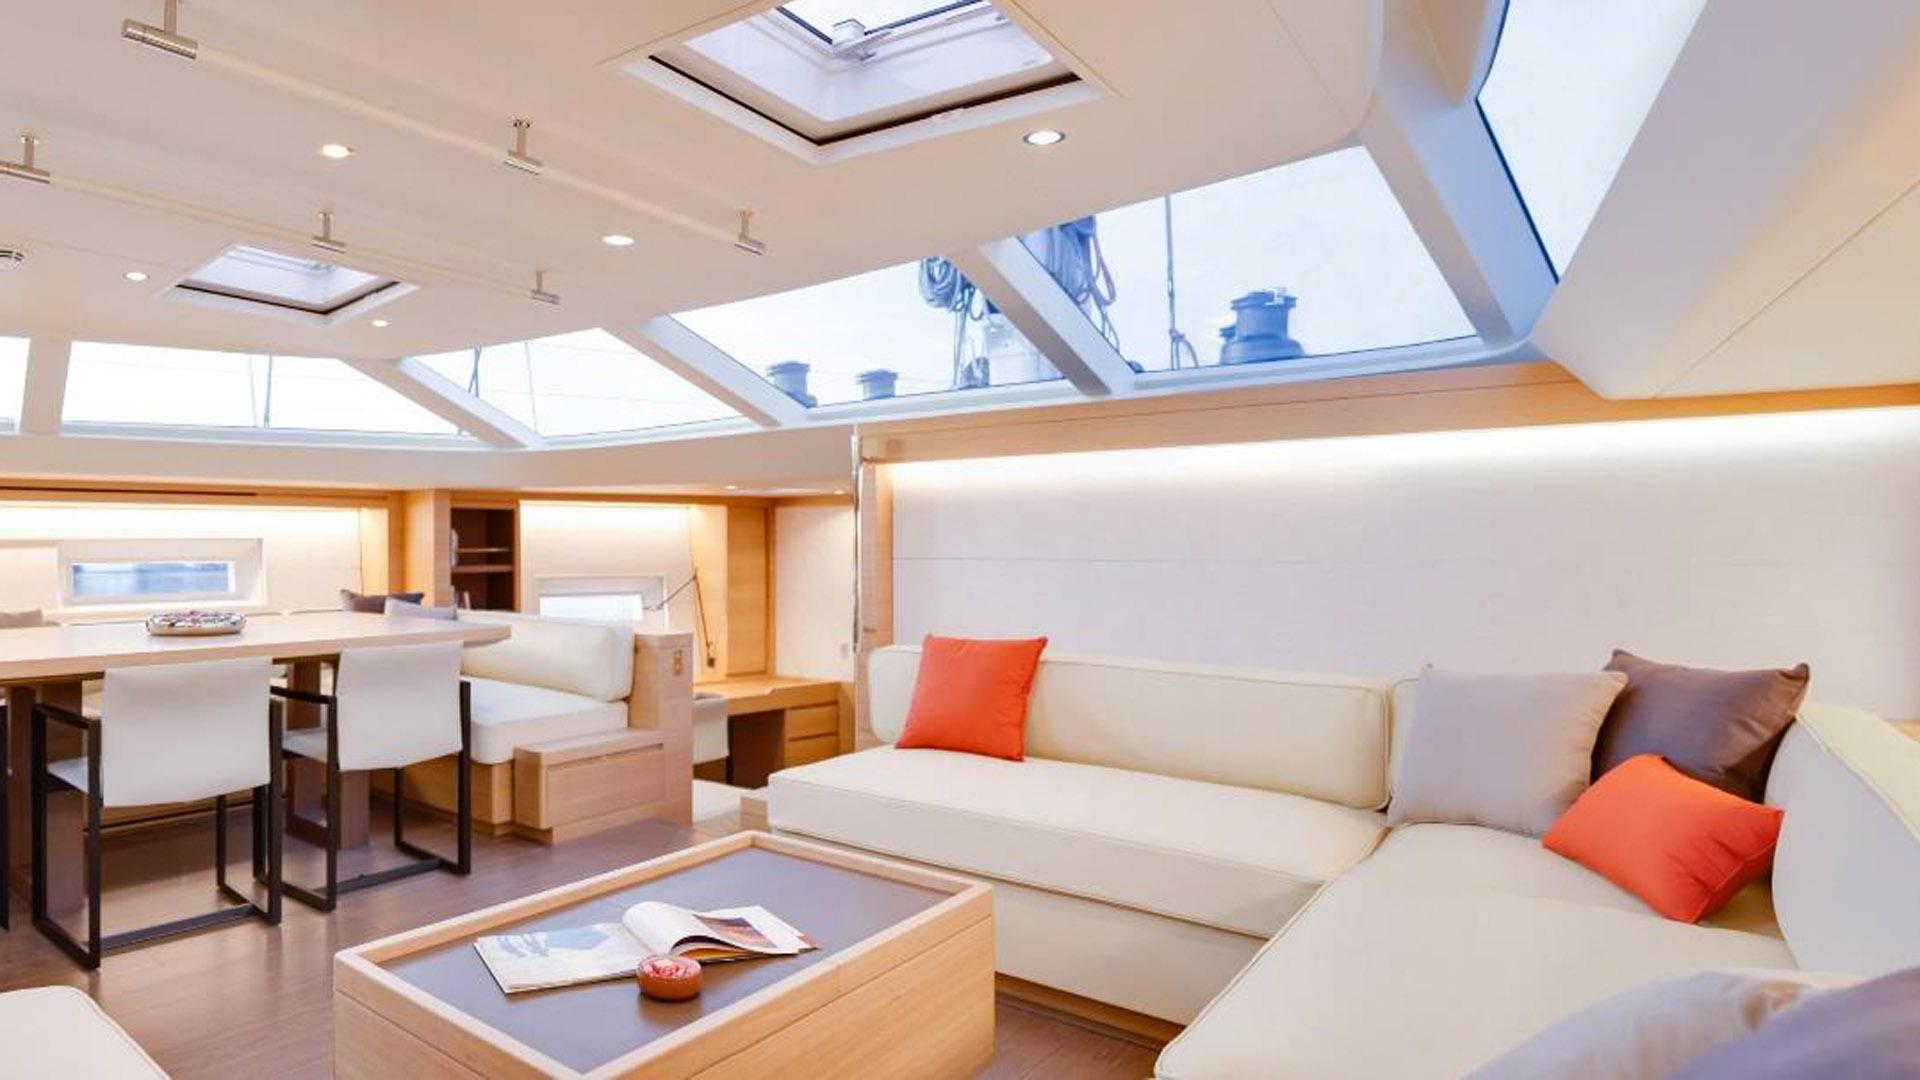 crossbow sailing yacht southern wind shipyard sws 102 2016 32m lounge corner